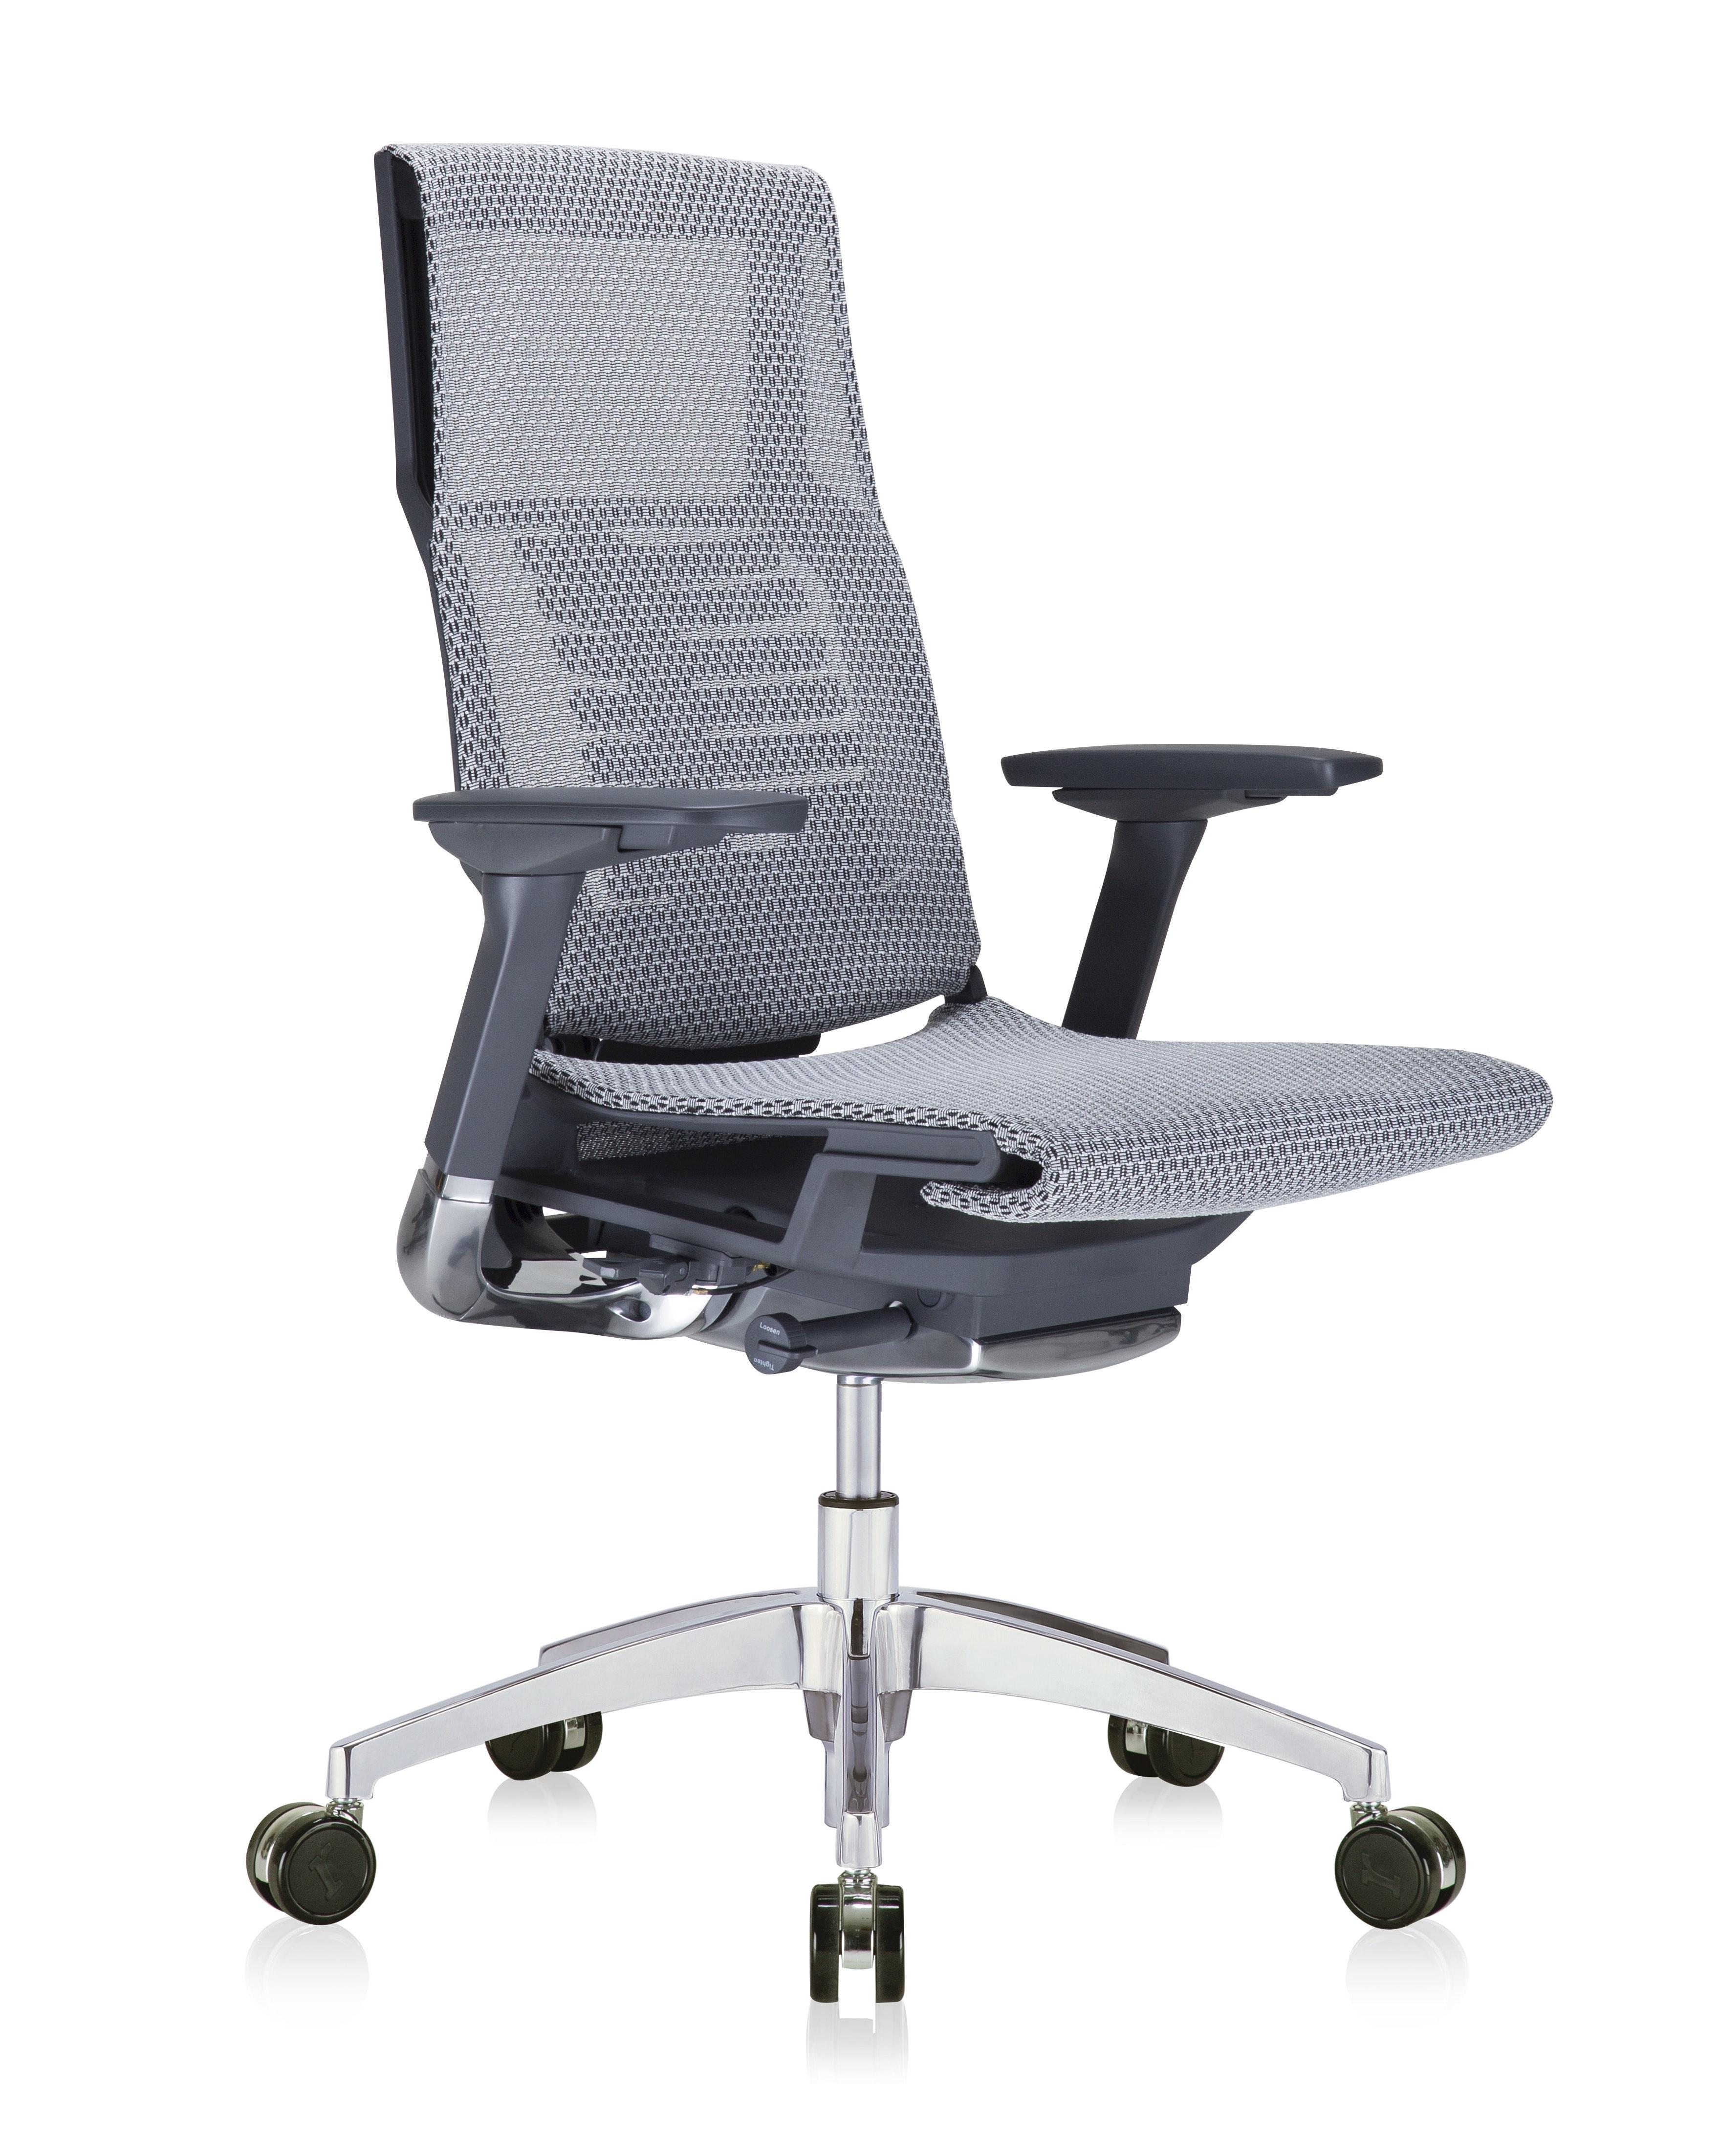 eurotech powerfit bluetooth enabled smart chair